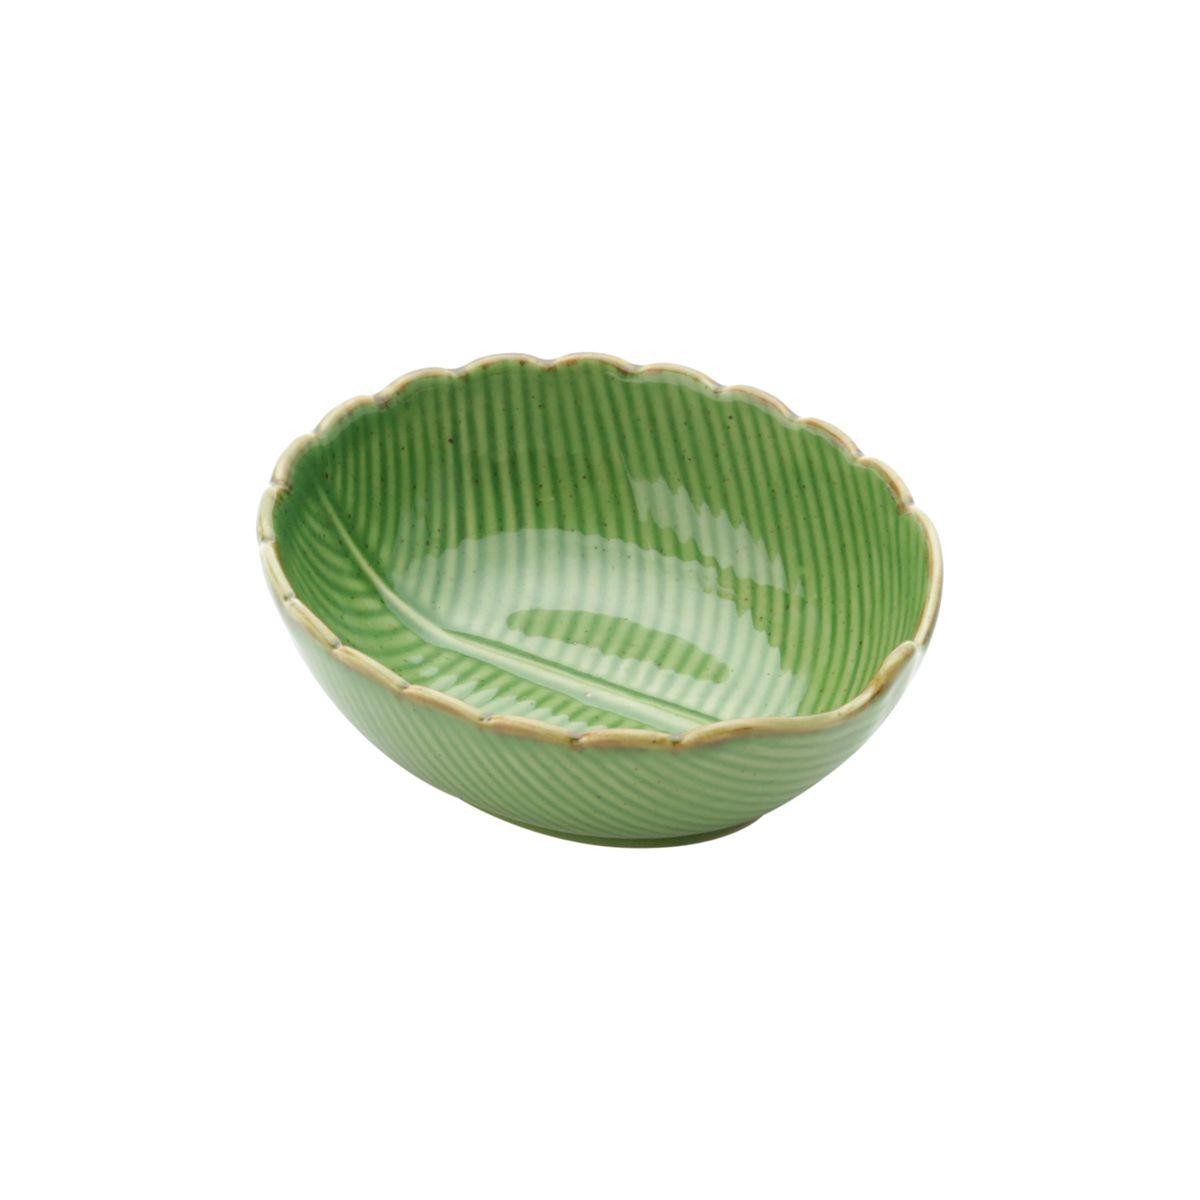 Centro de mesa 11,5 x 10 cm de cerâmica verde Banana Leaf Lyor - L4132